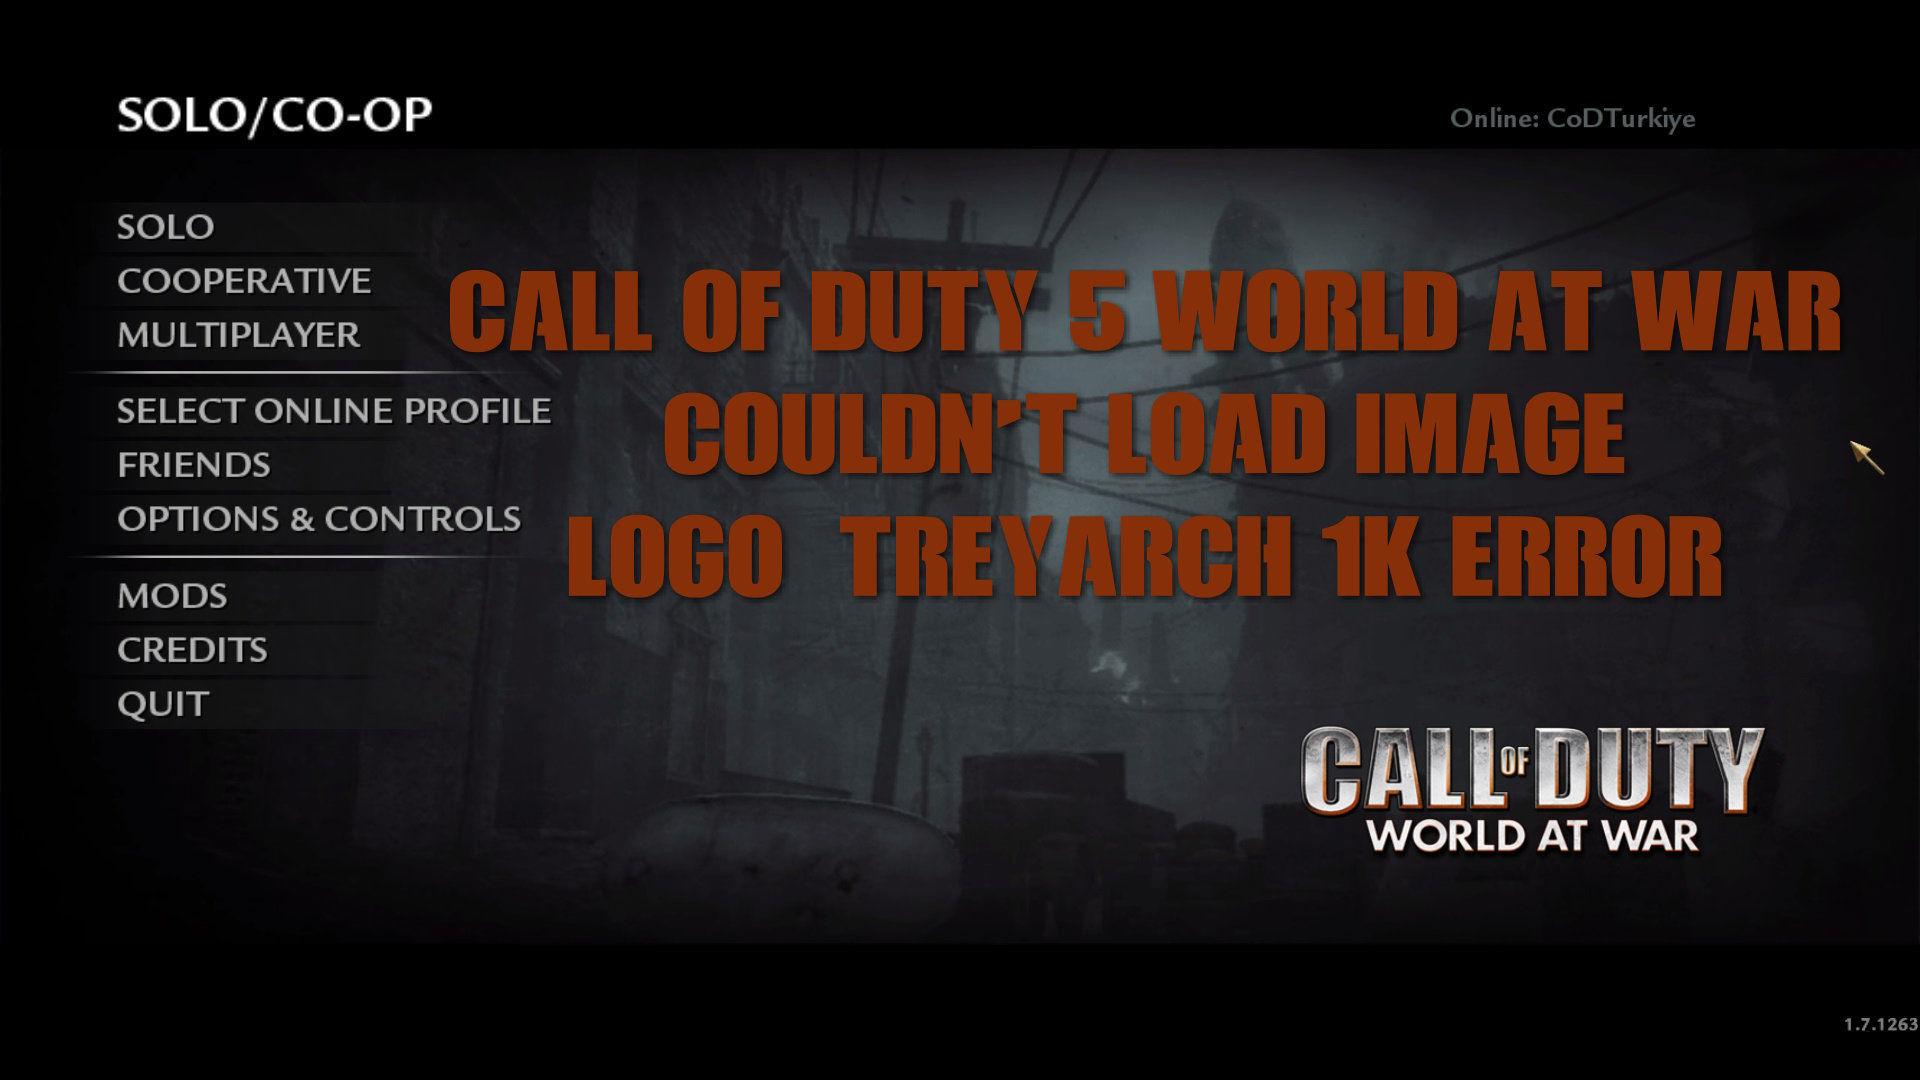 Call of Duty 5 World At War Couldnt Load Image logo_treyarch_1k Error